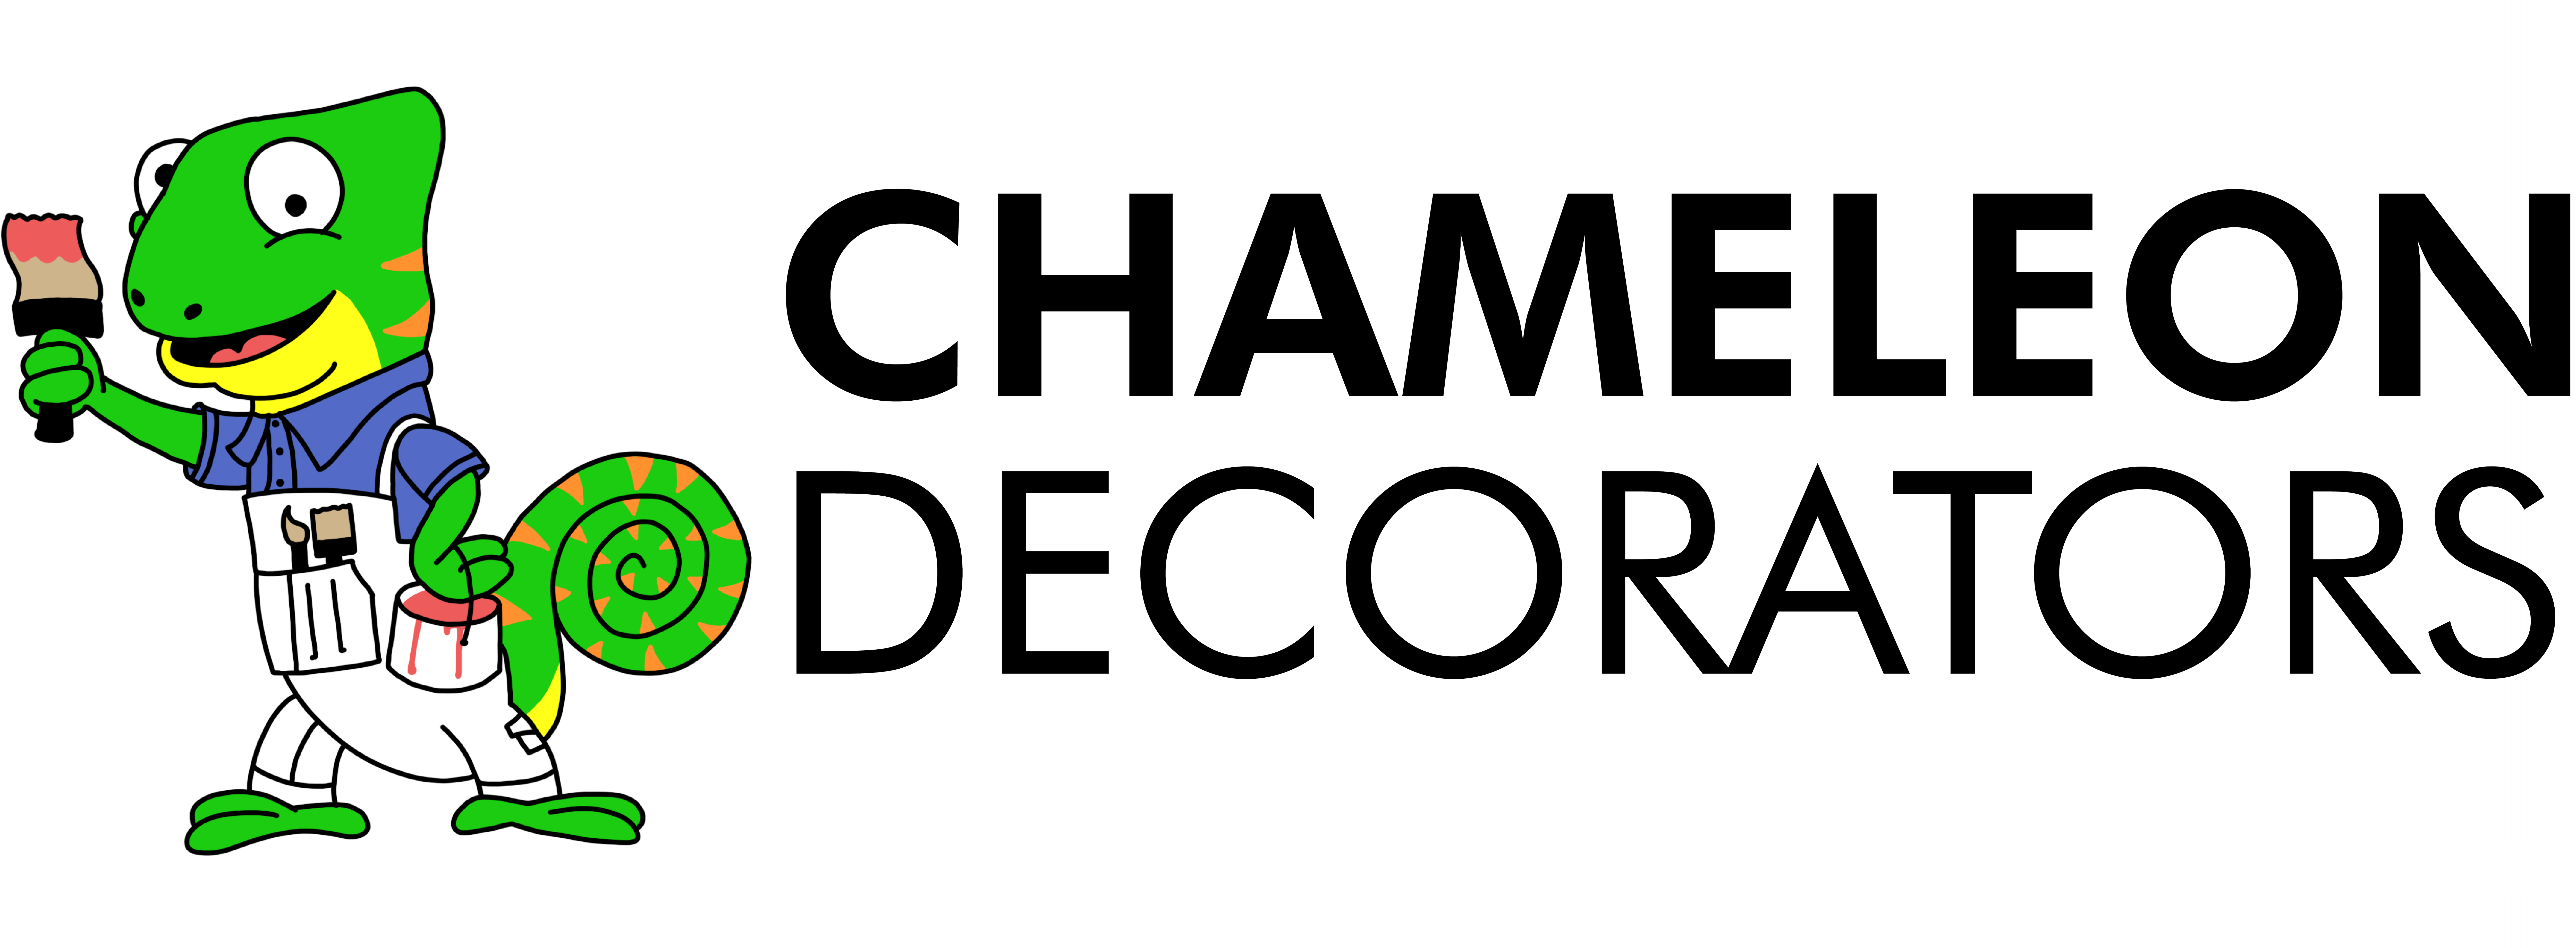 Chameleon Decorators Ltd.